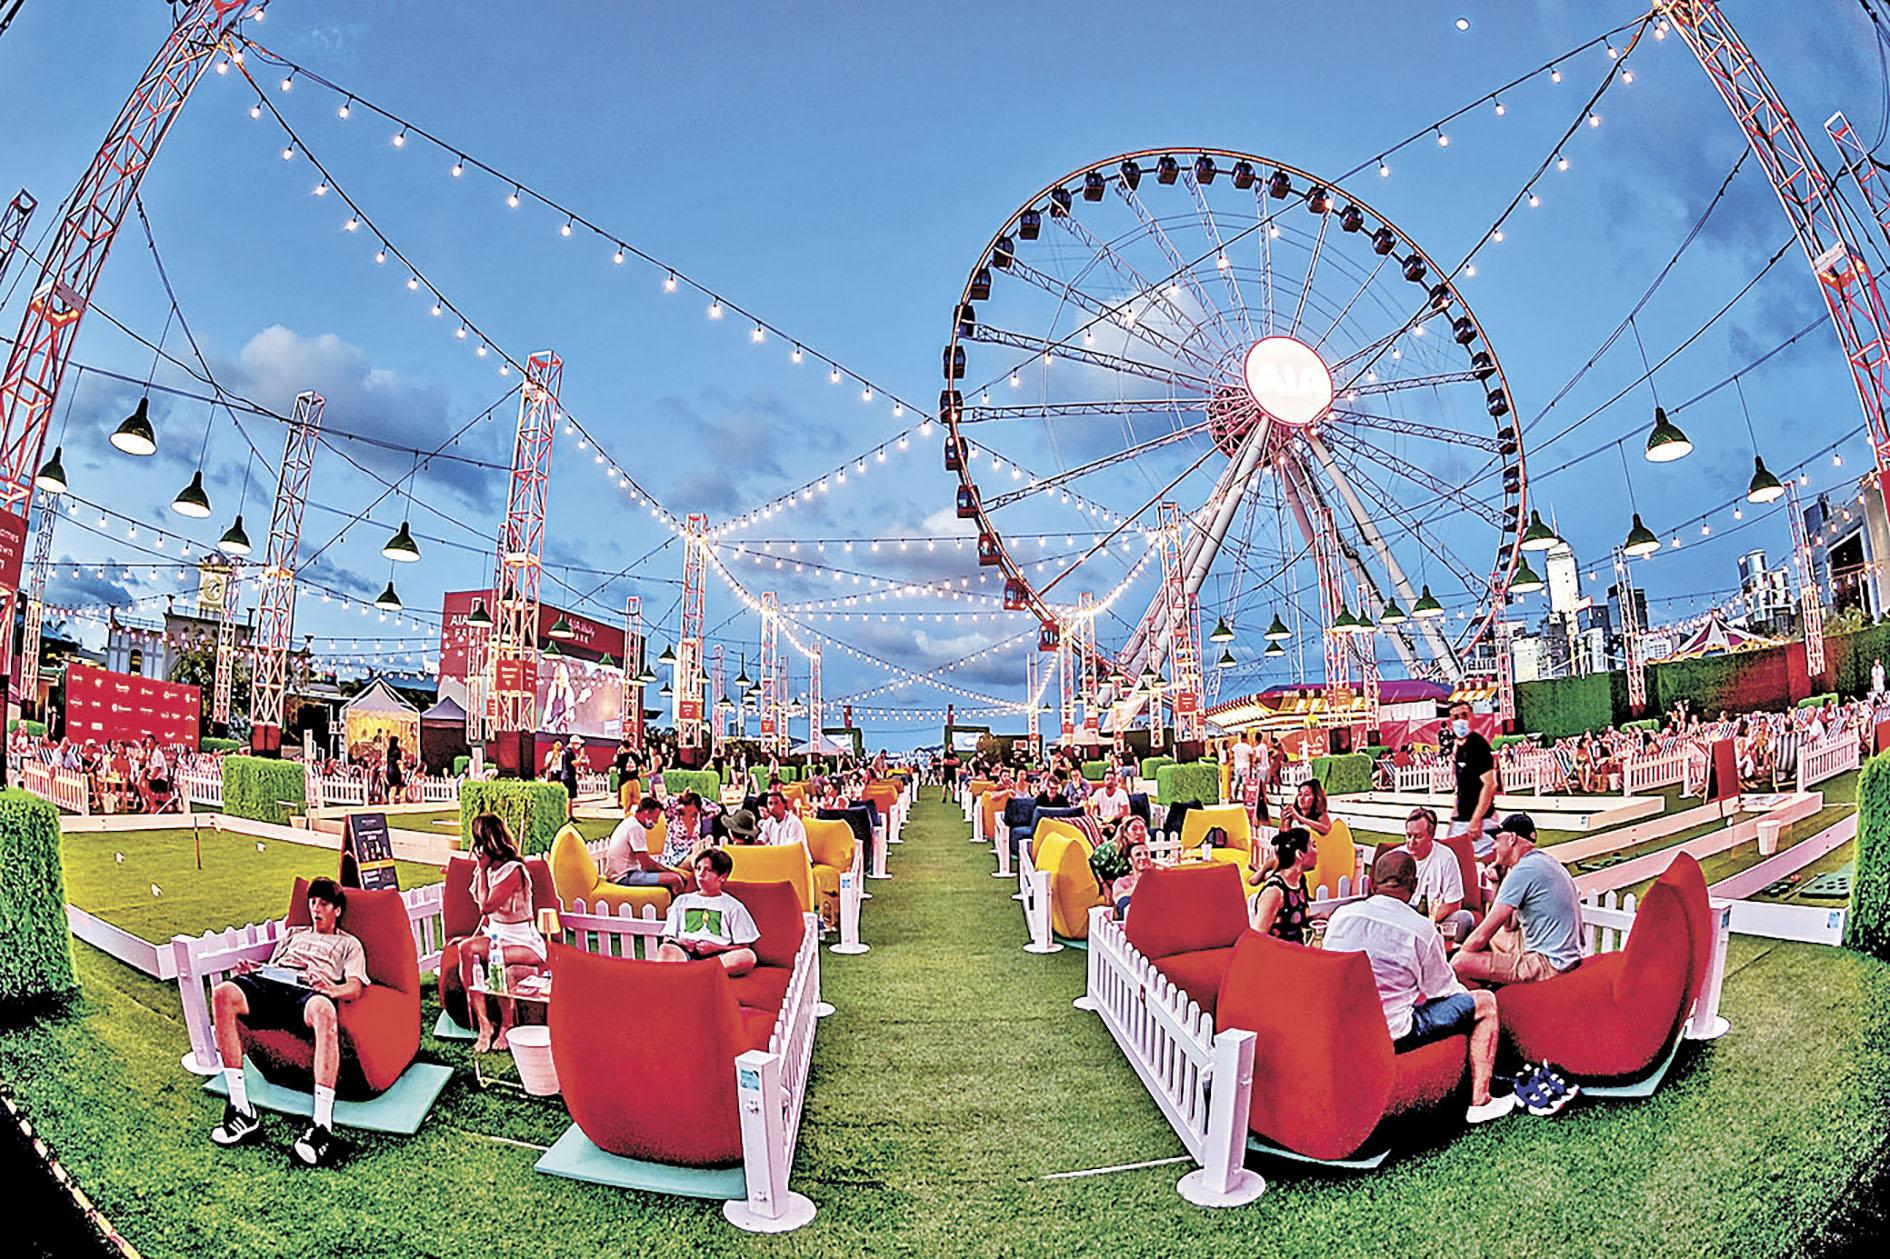 ■The Lawn Club夏日園遊會(中環AIA Vitality公園)